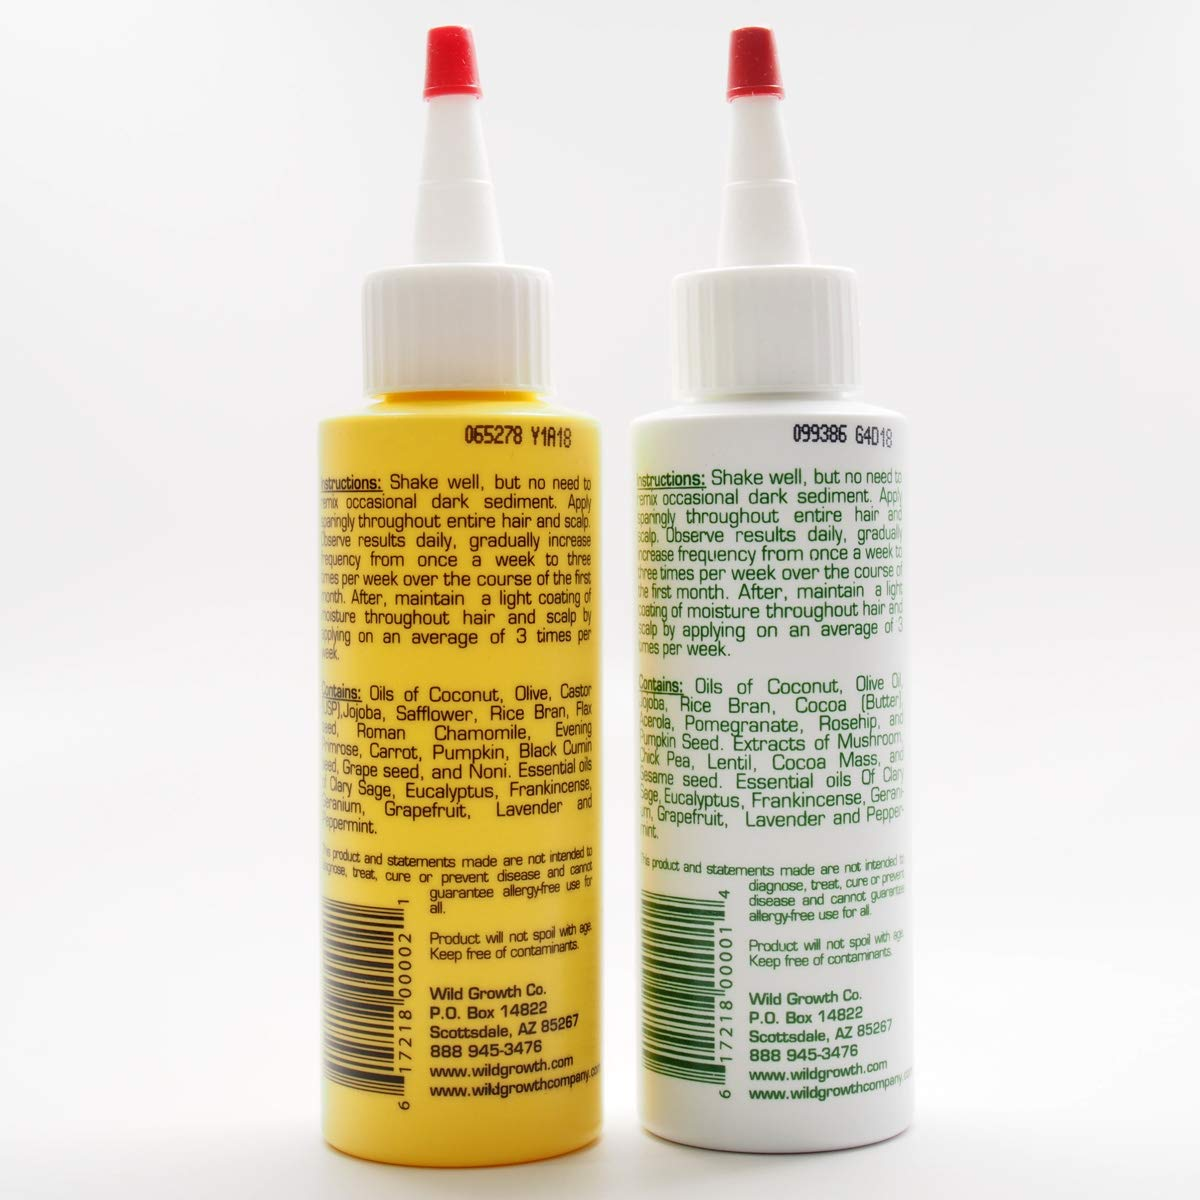 Wild Growth Set (Hair Oil 4 oz + Light Oil Moisturizer 4 oz) by Wild Growth